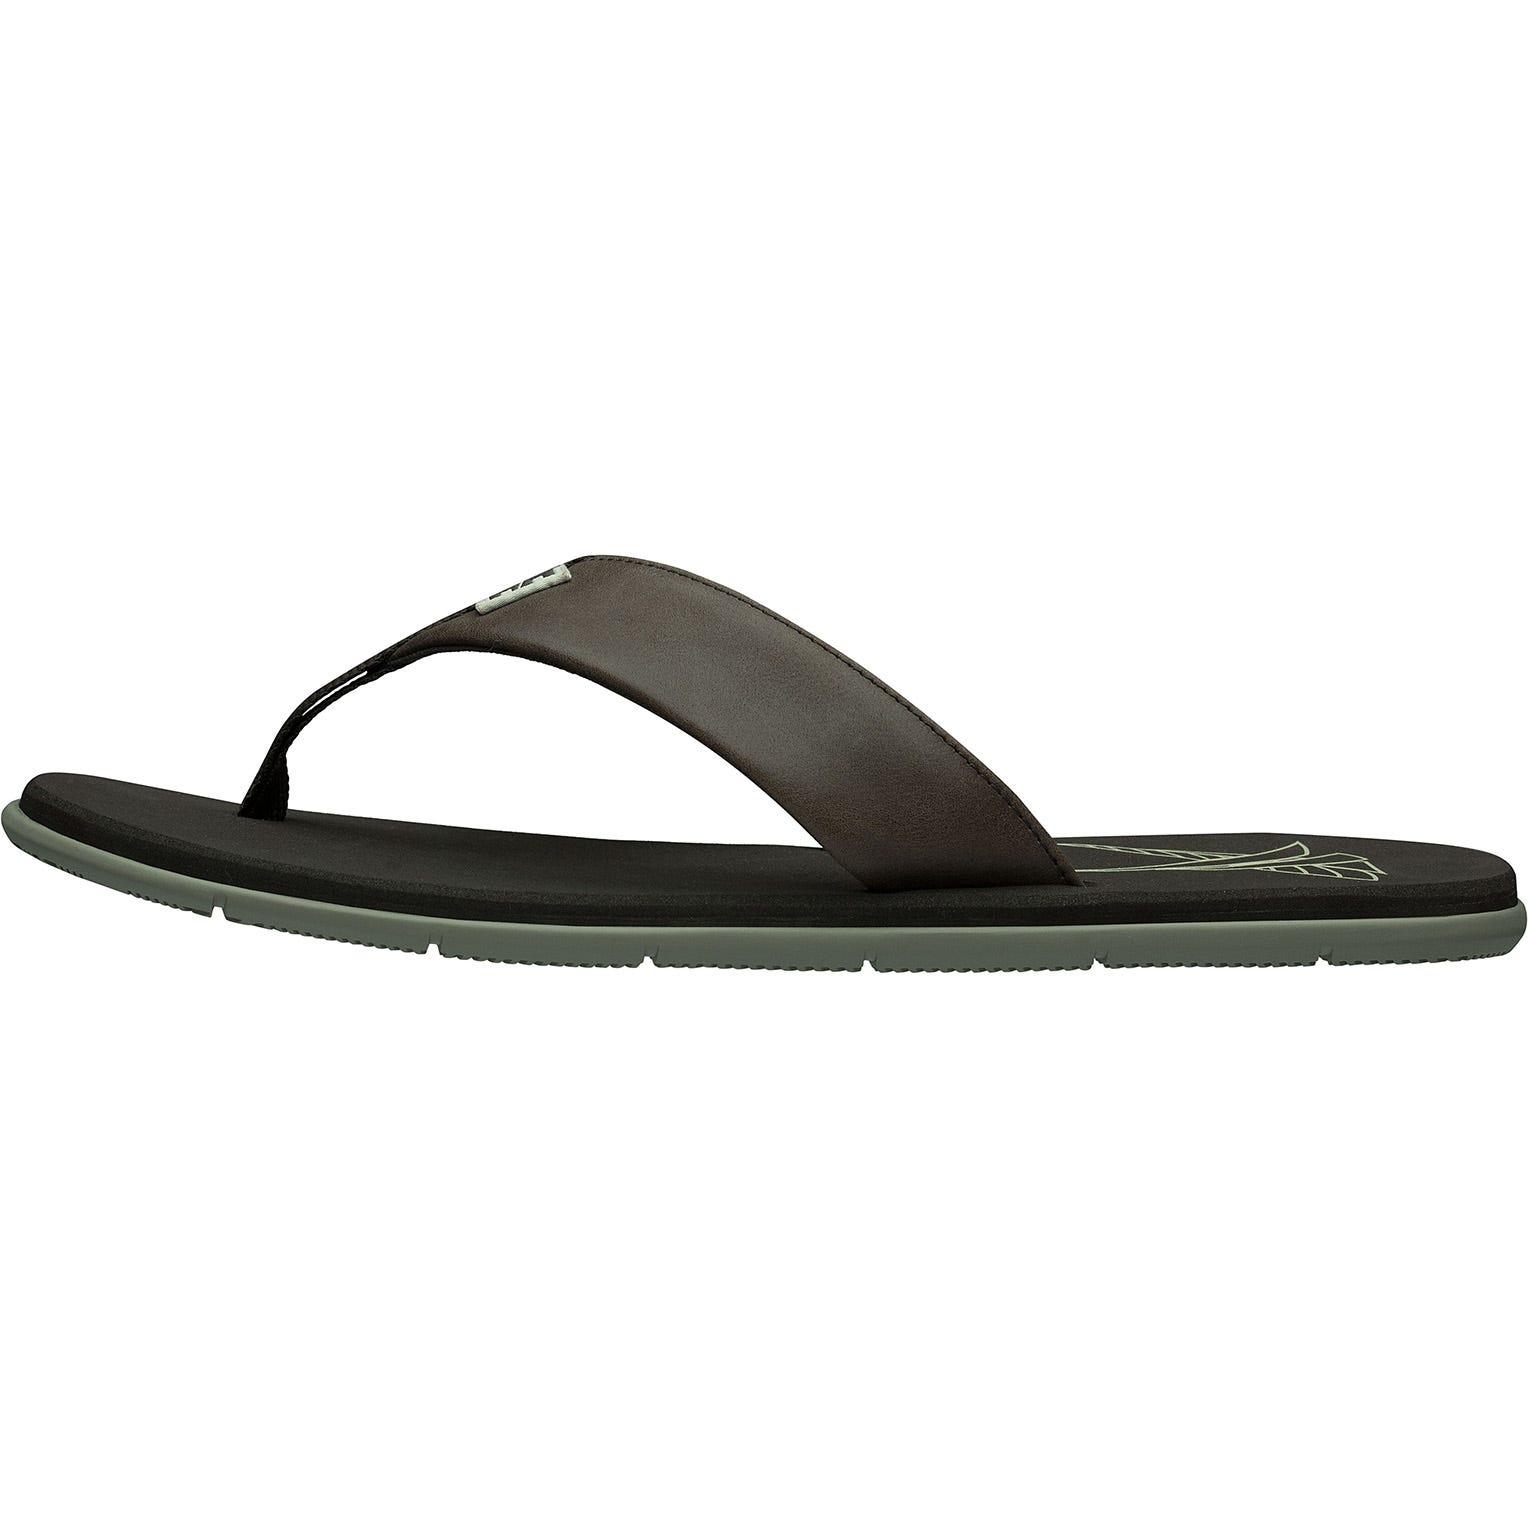 Helly Hansen Seasand Leather Sandal Mens Brown 46.5/12